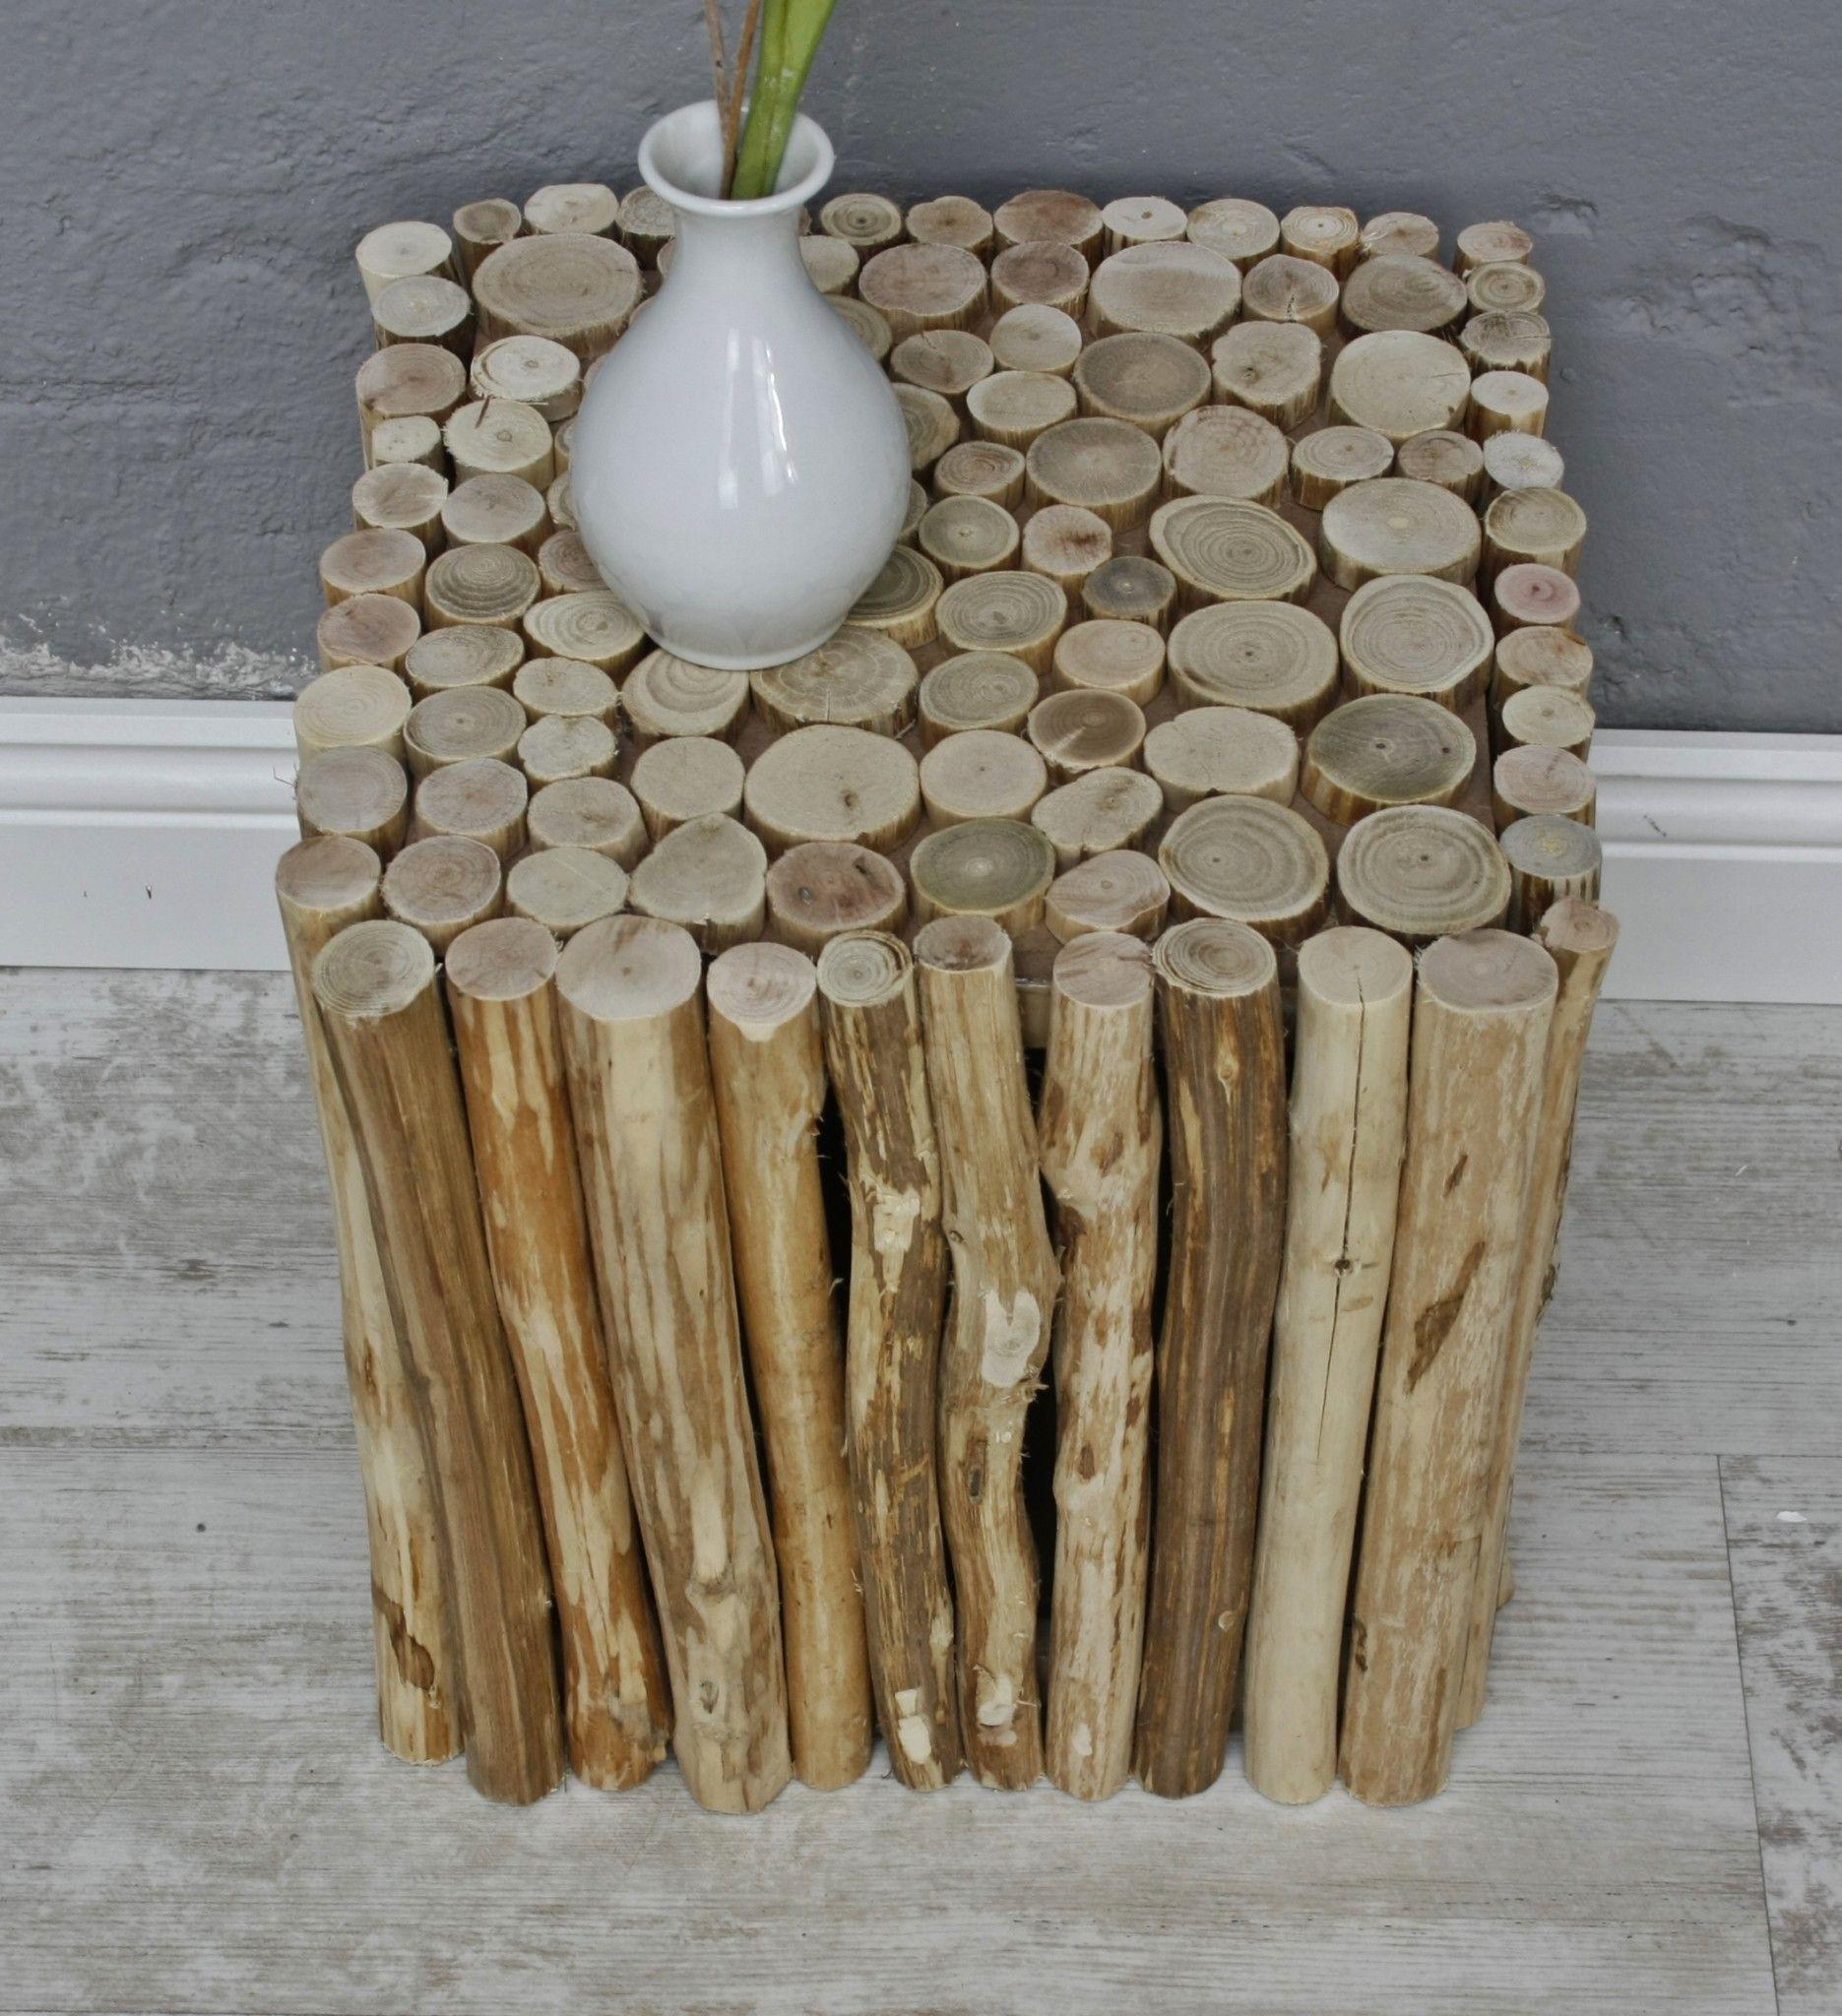 Hocker Beistelltisch Holz Eckig Hocker Holz